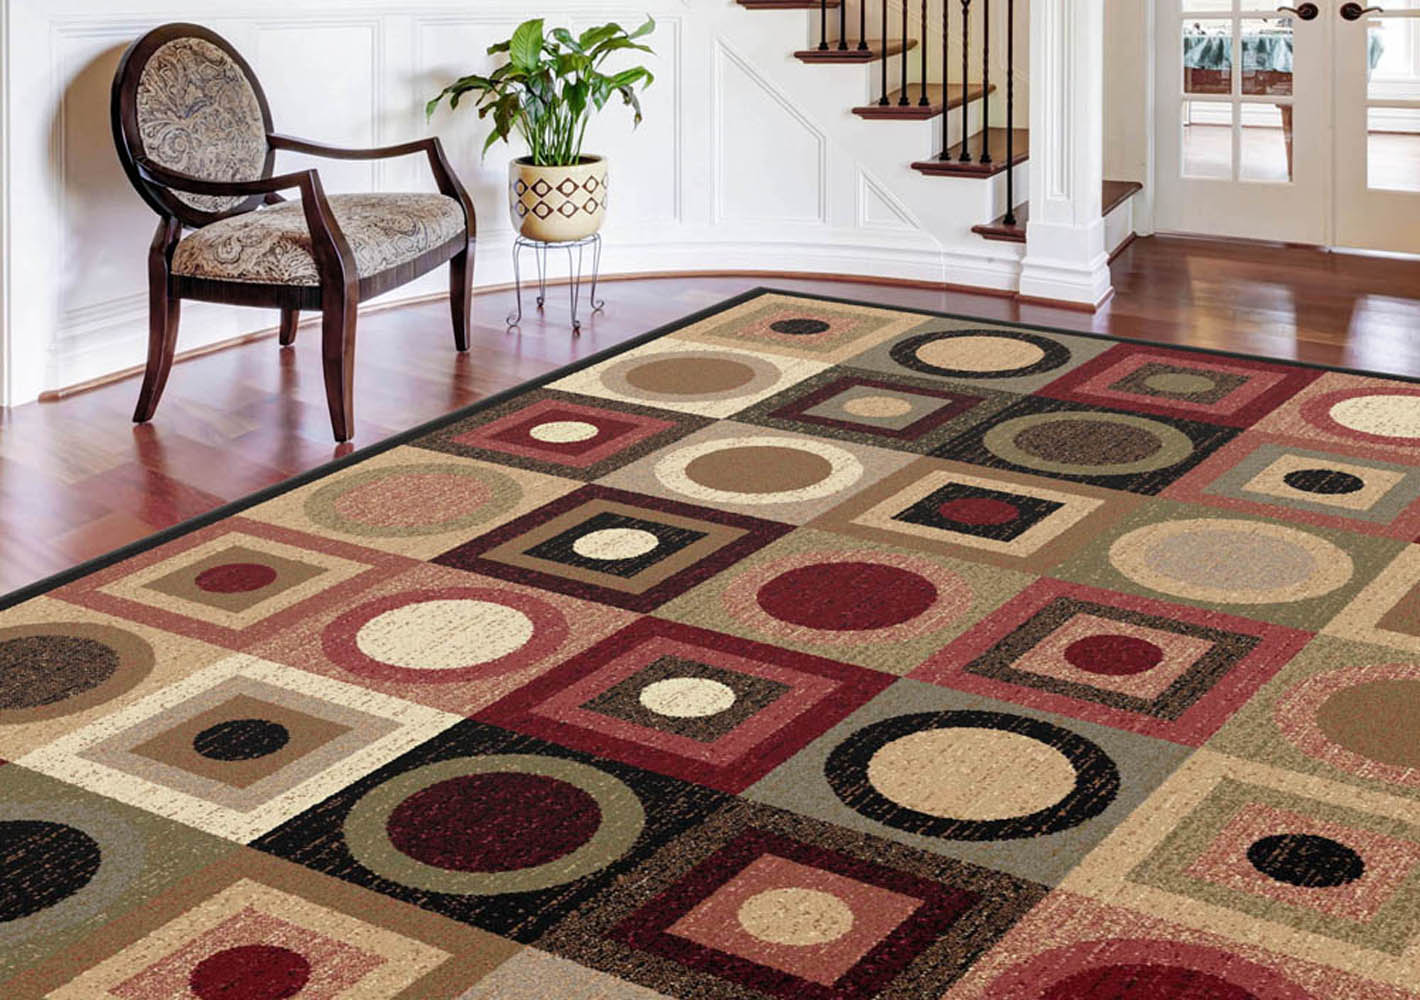 Contemporary Multi Shapes 5x8 Area Rug Modern Carpet